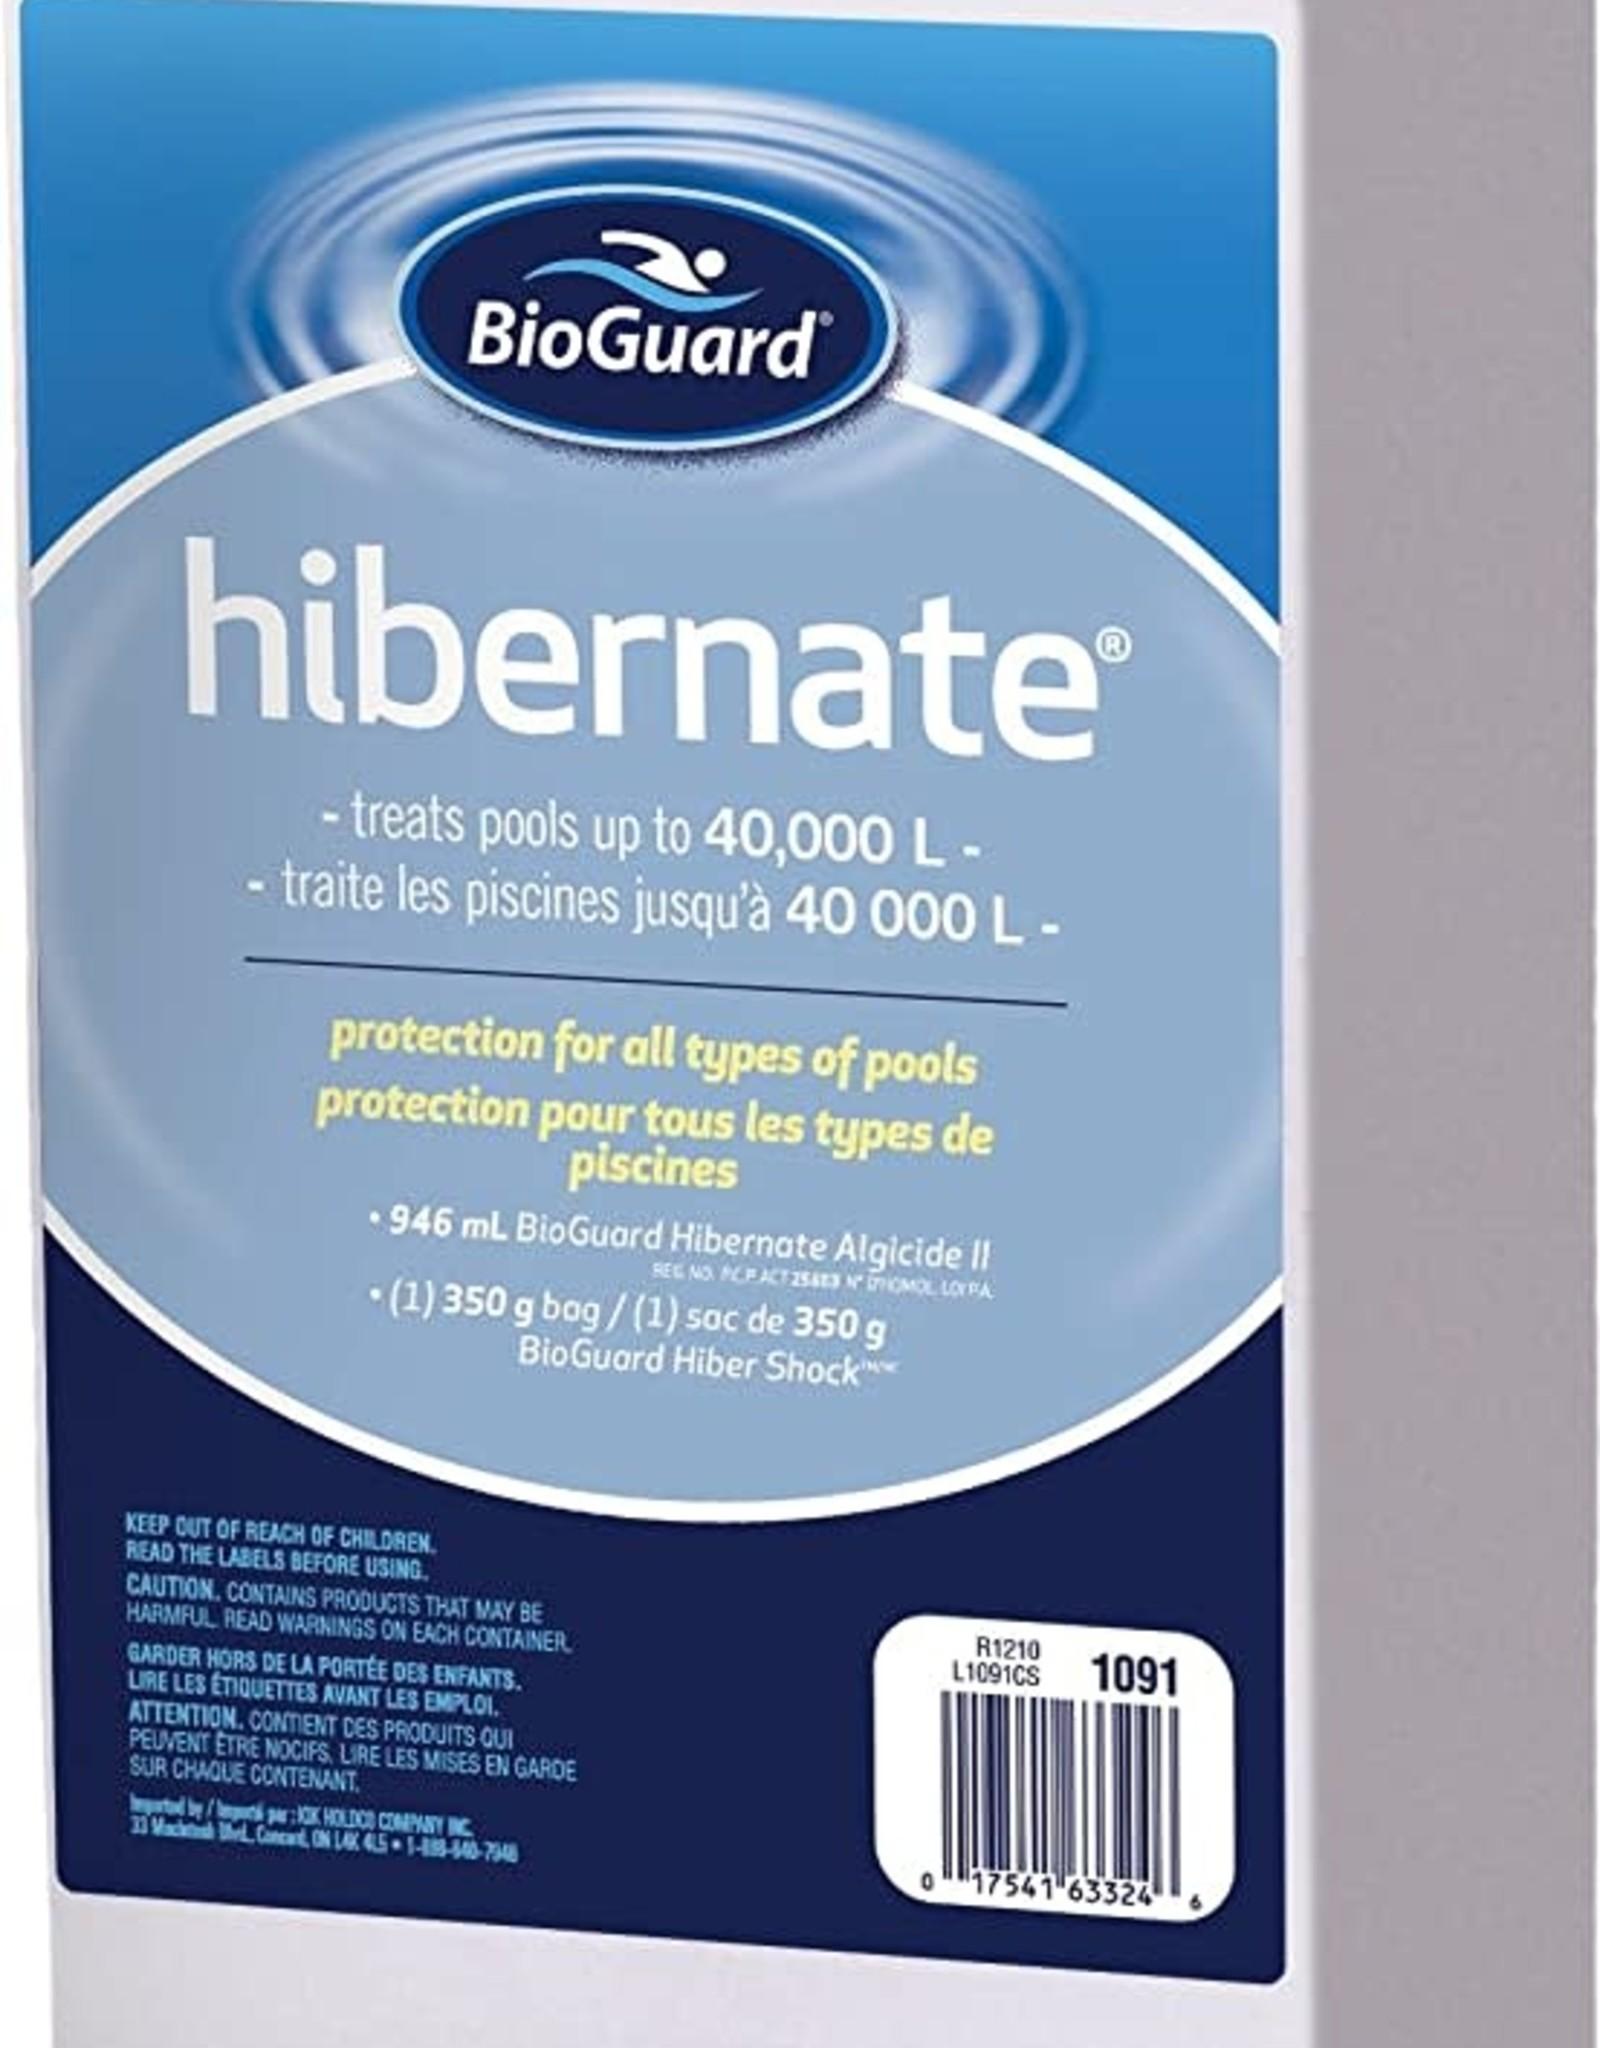 BIOGUARD BIOGUARD HIBERNATE KIT 40 000L